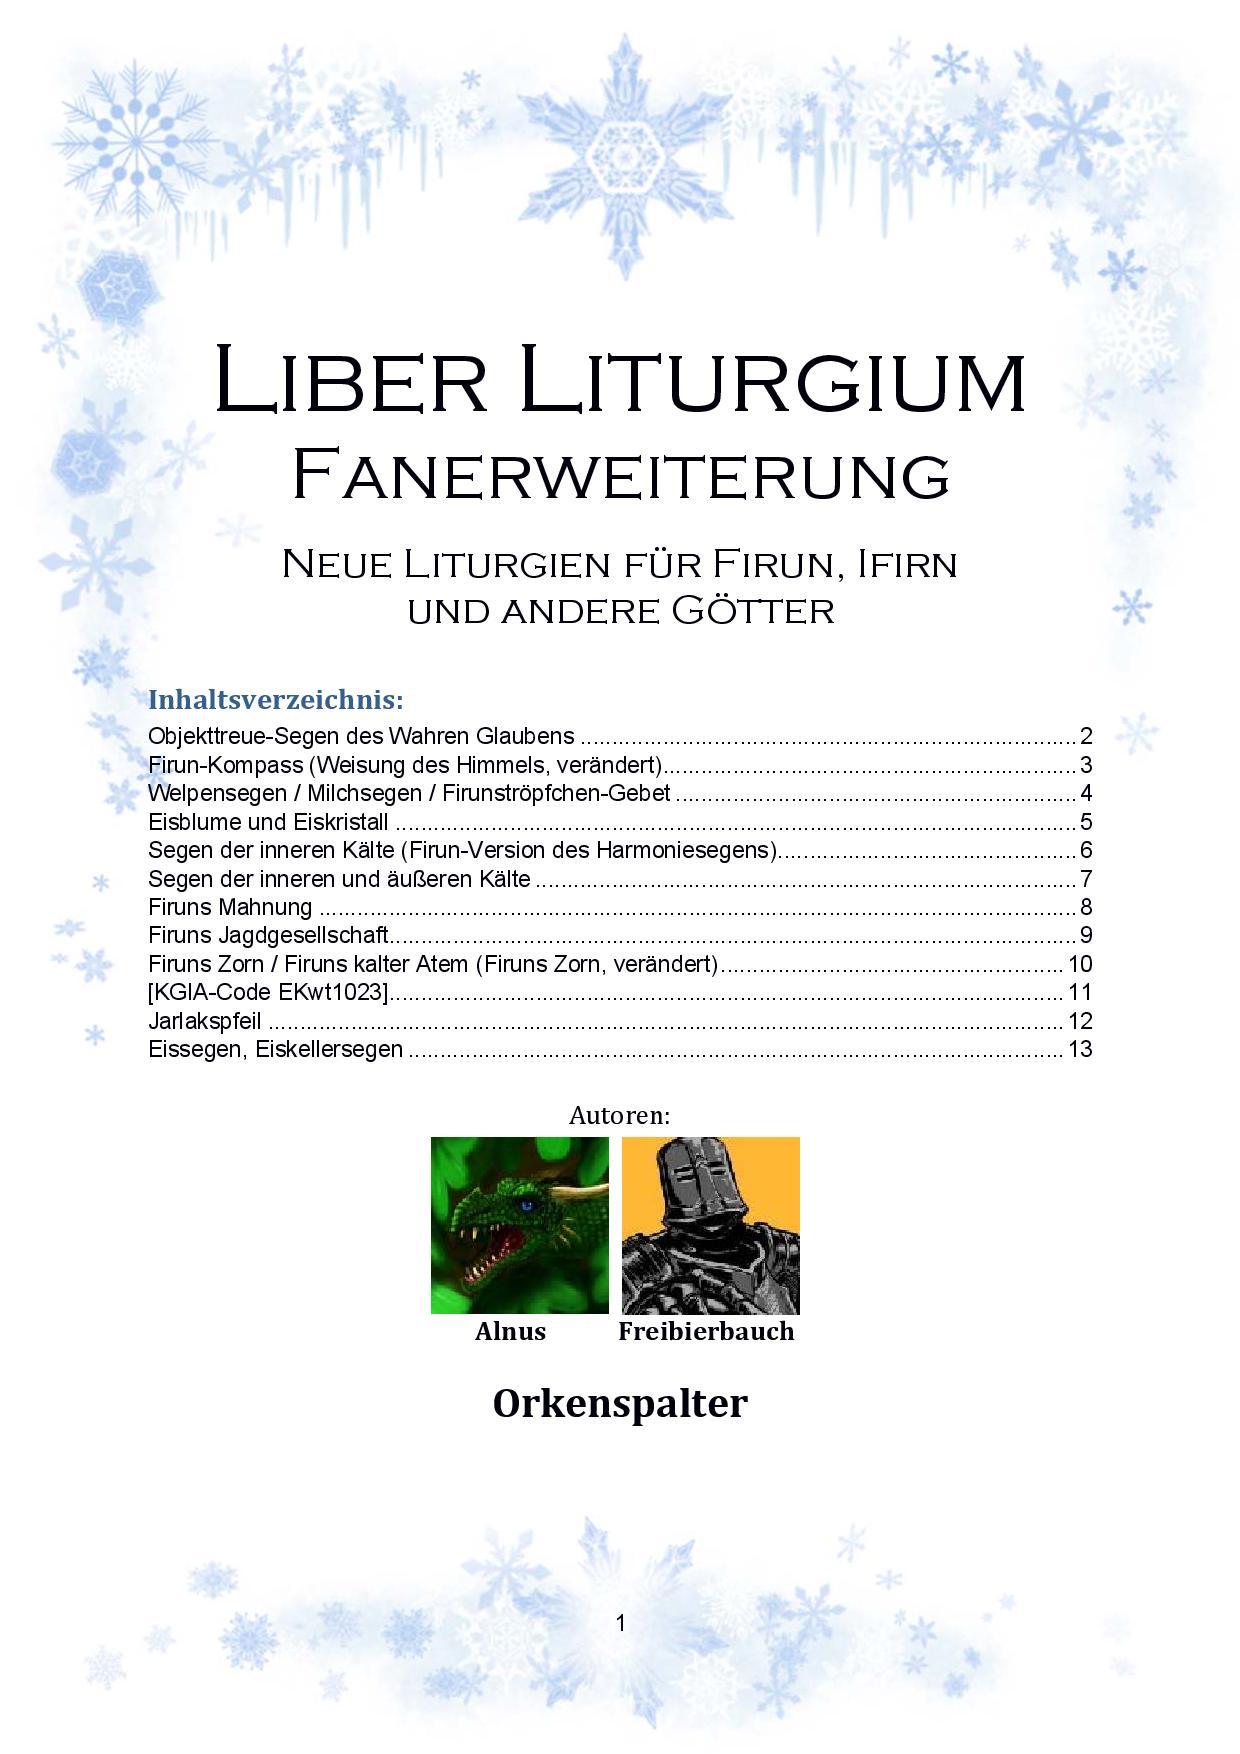 dsa liber liturgium pdf